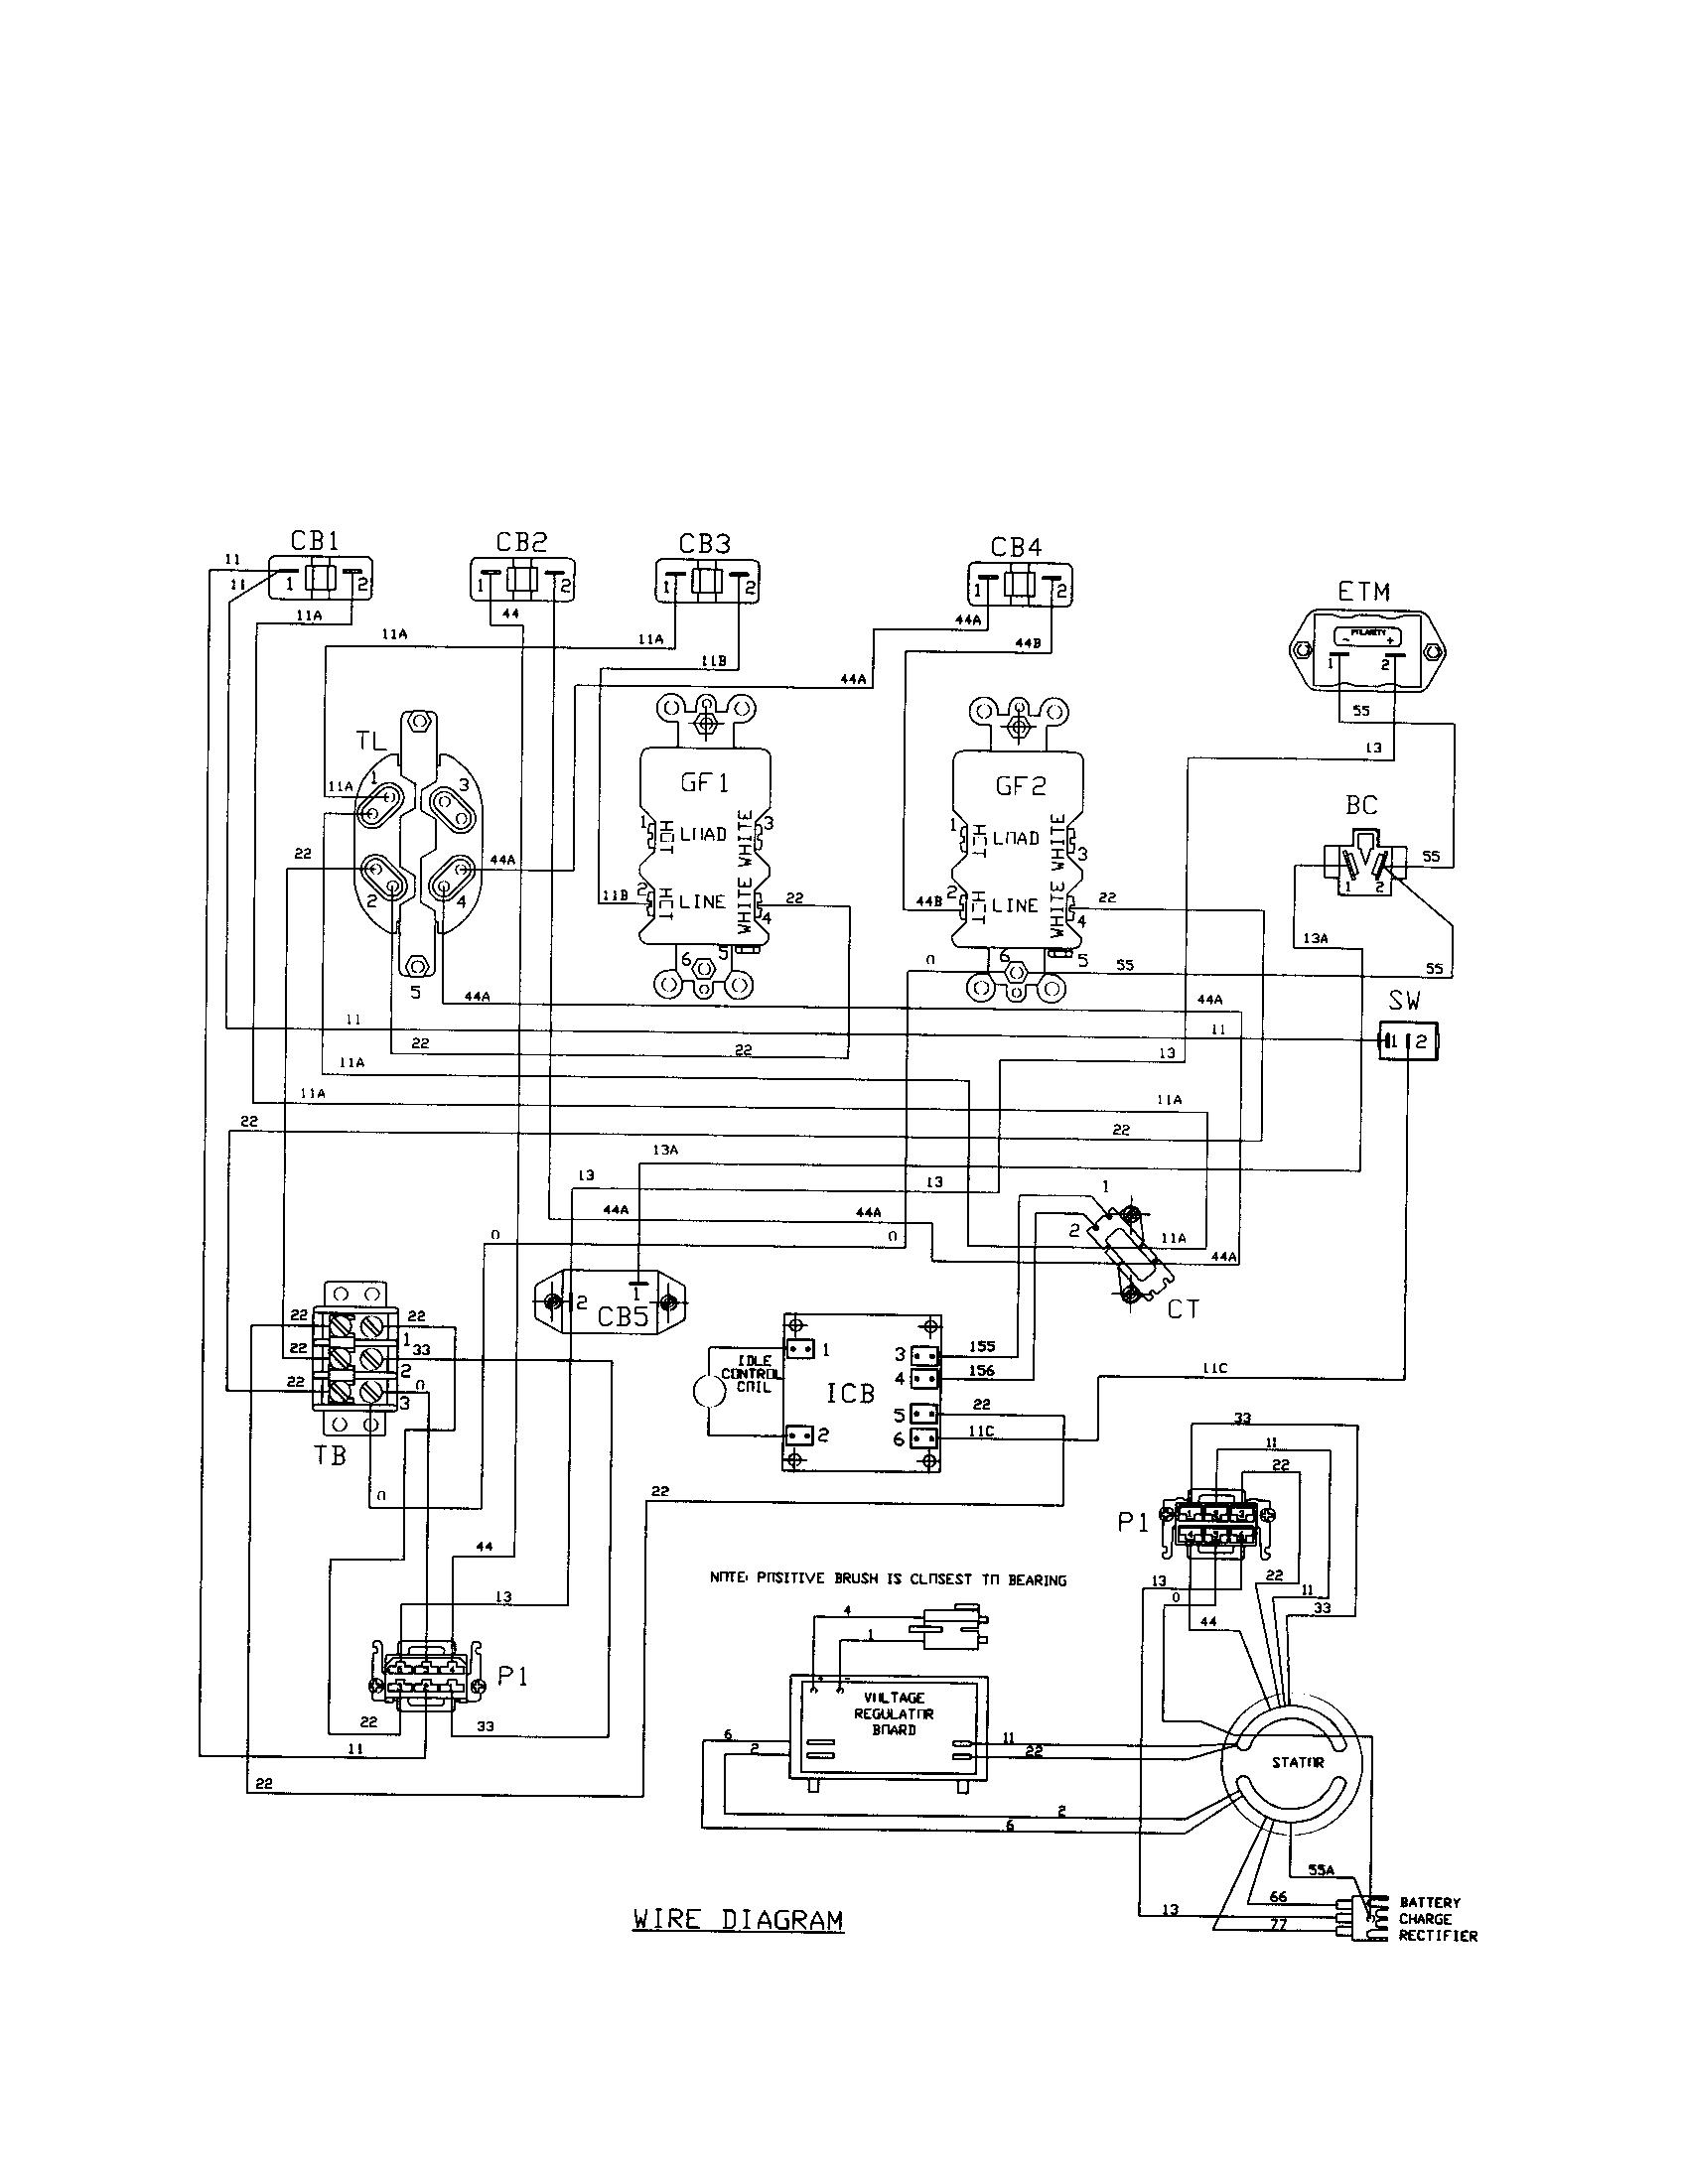 briggs and stratton key switch wiring diagram bb 2891  briggs and stratton wiring diagram 16 hp wiring diagram  briggs and stratton wiring diagram